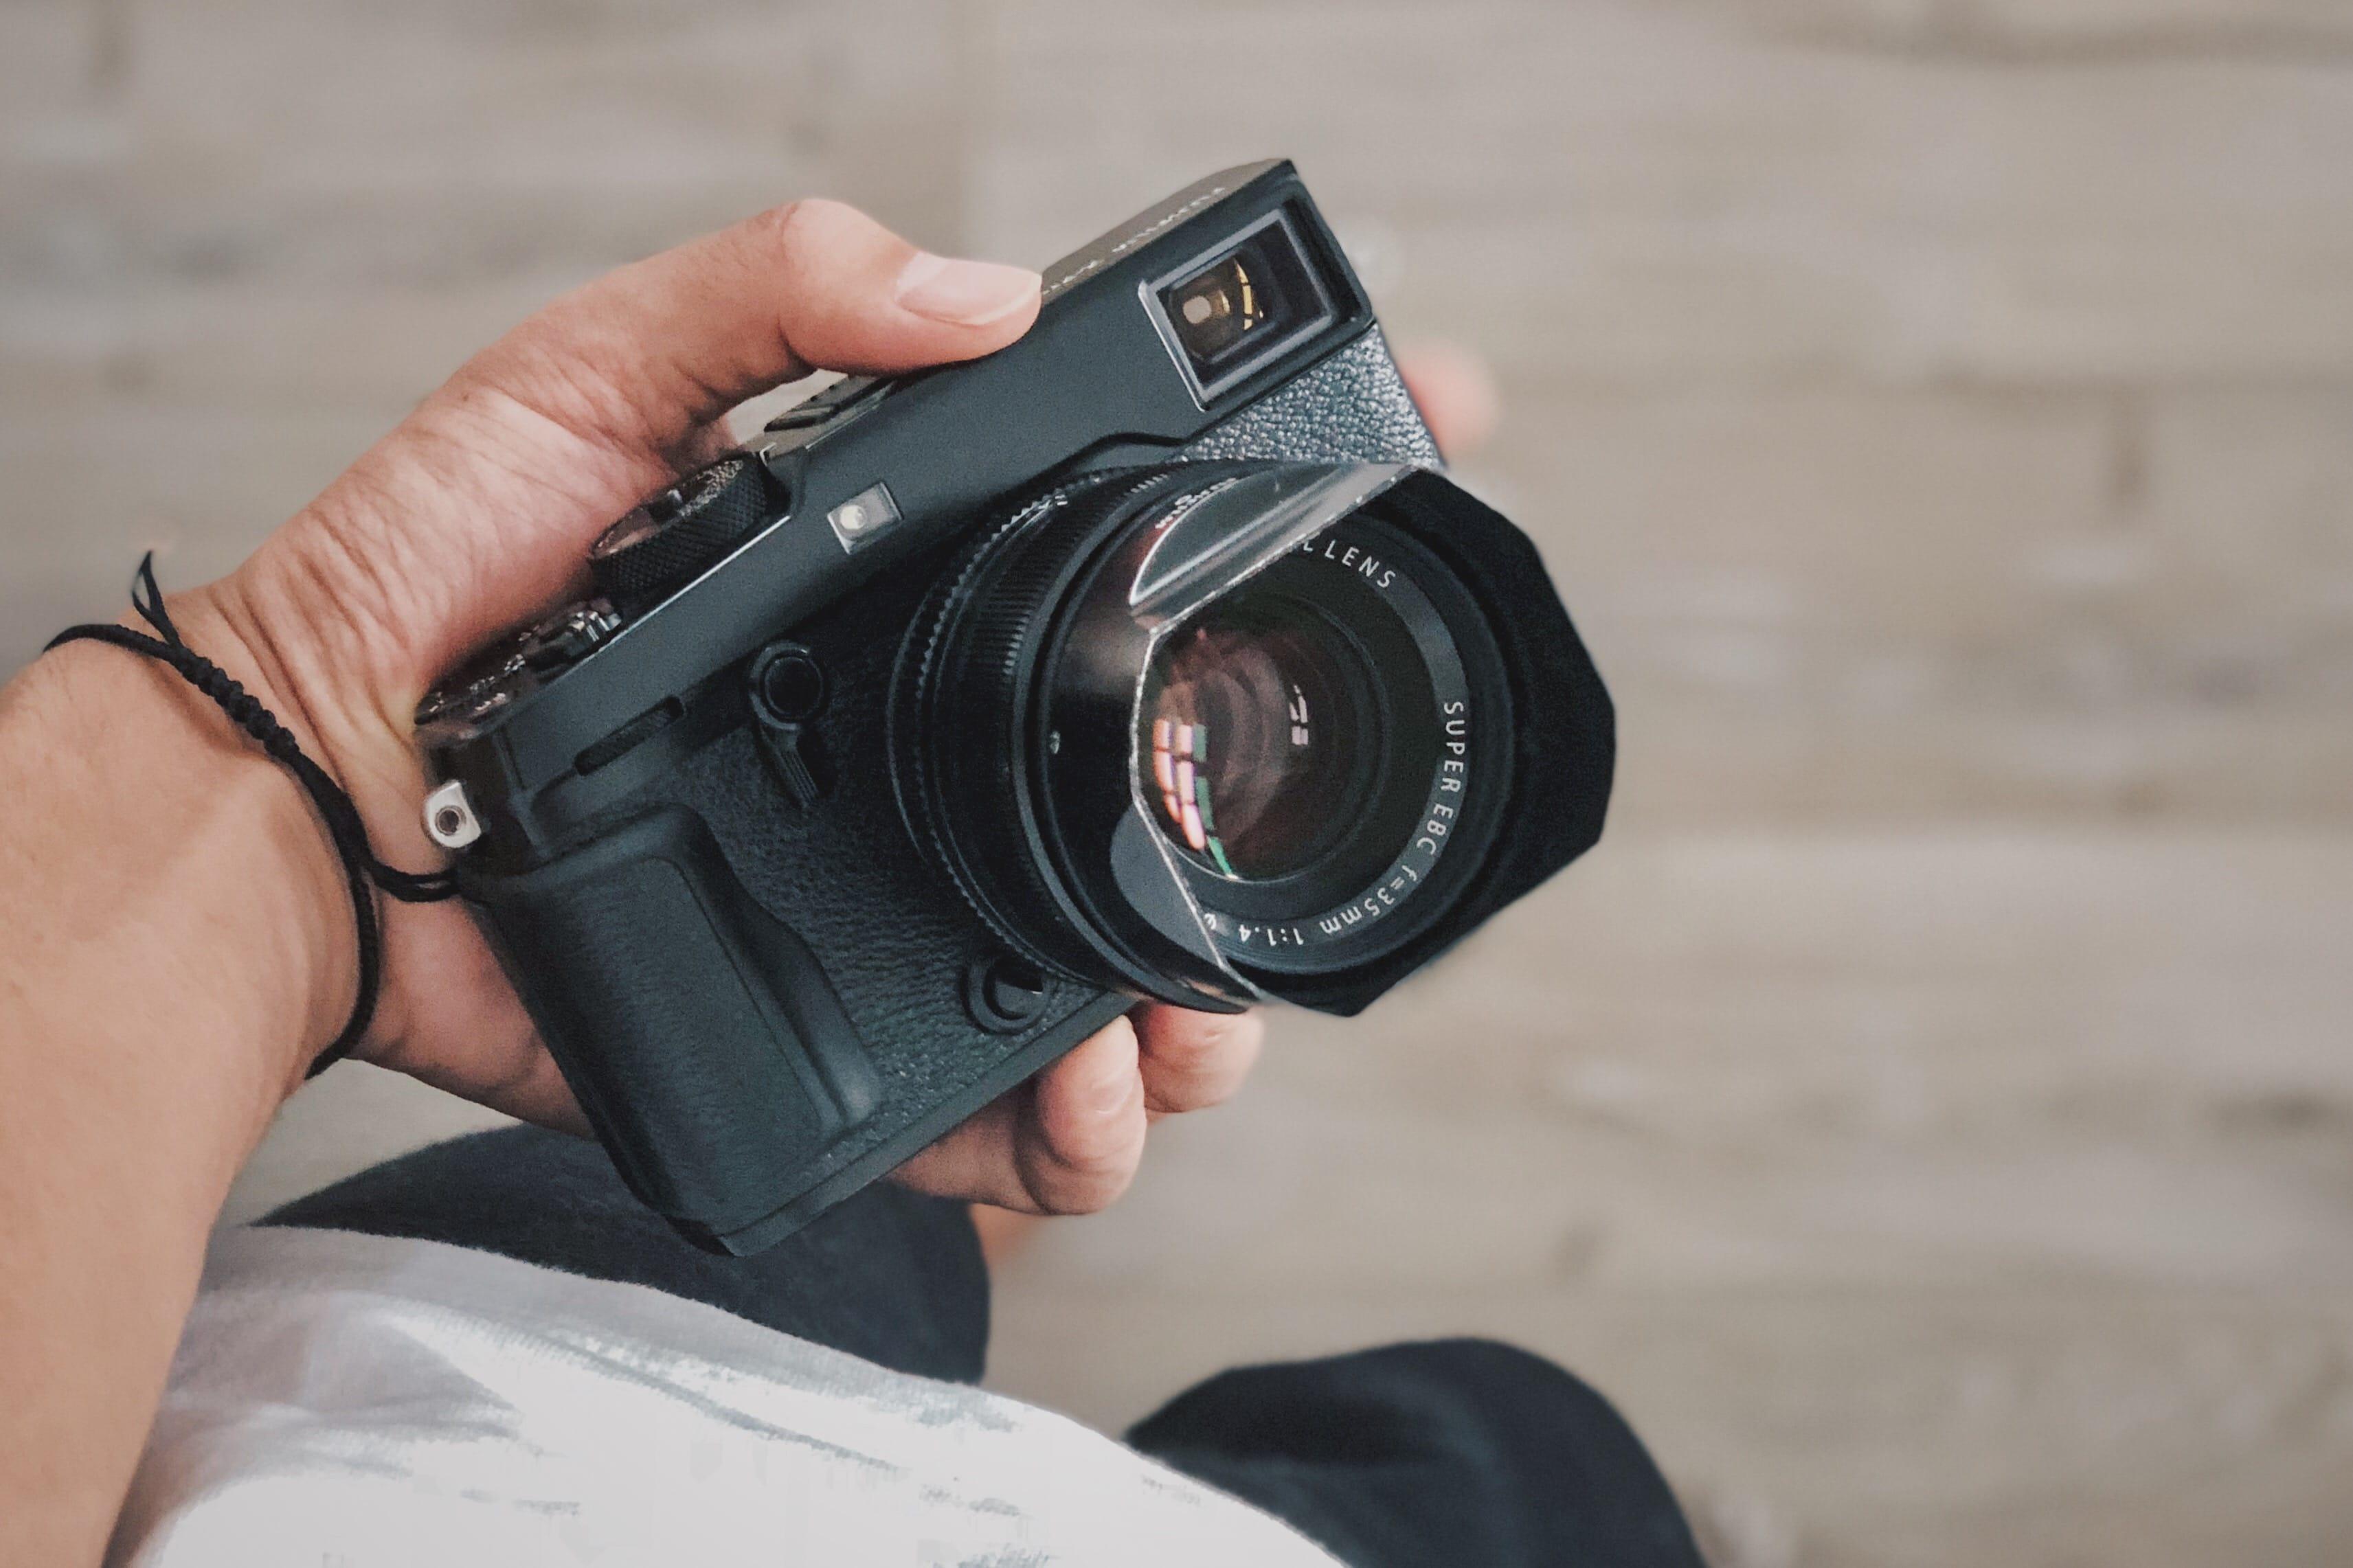 FUJIFILM X-Pro2 2年使用レビュー。その魅力と素晴らしさを2年越しに語る【作例あり】